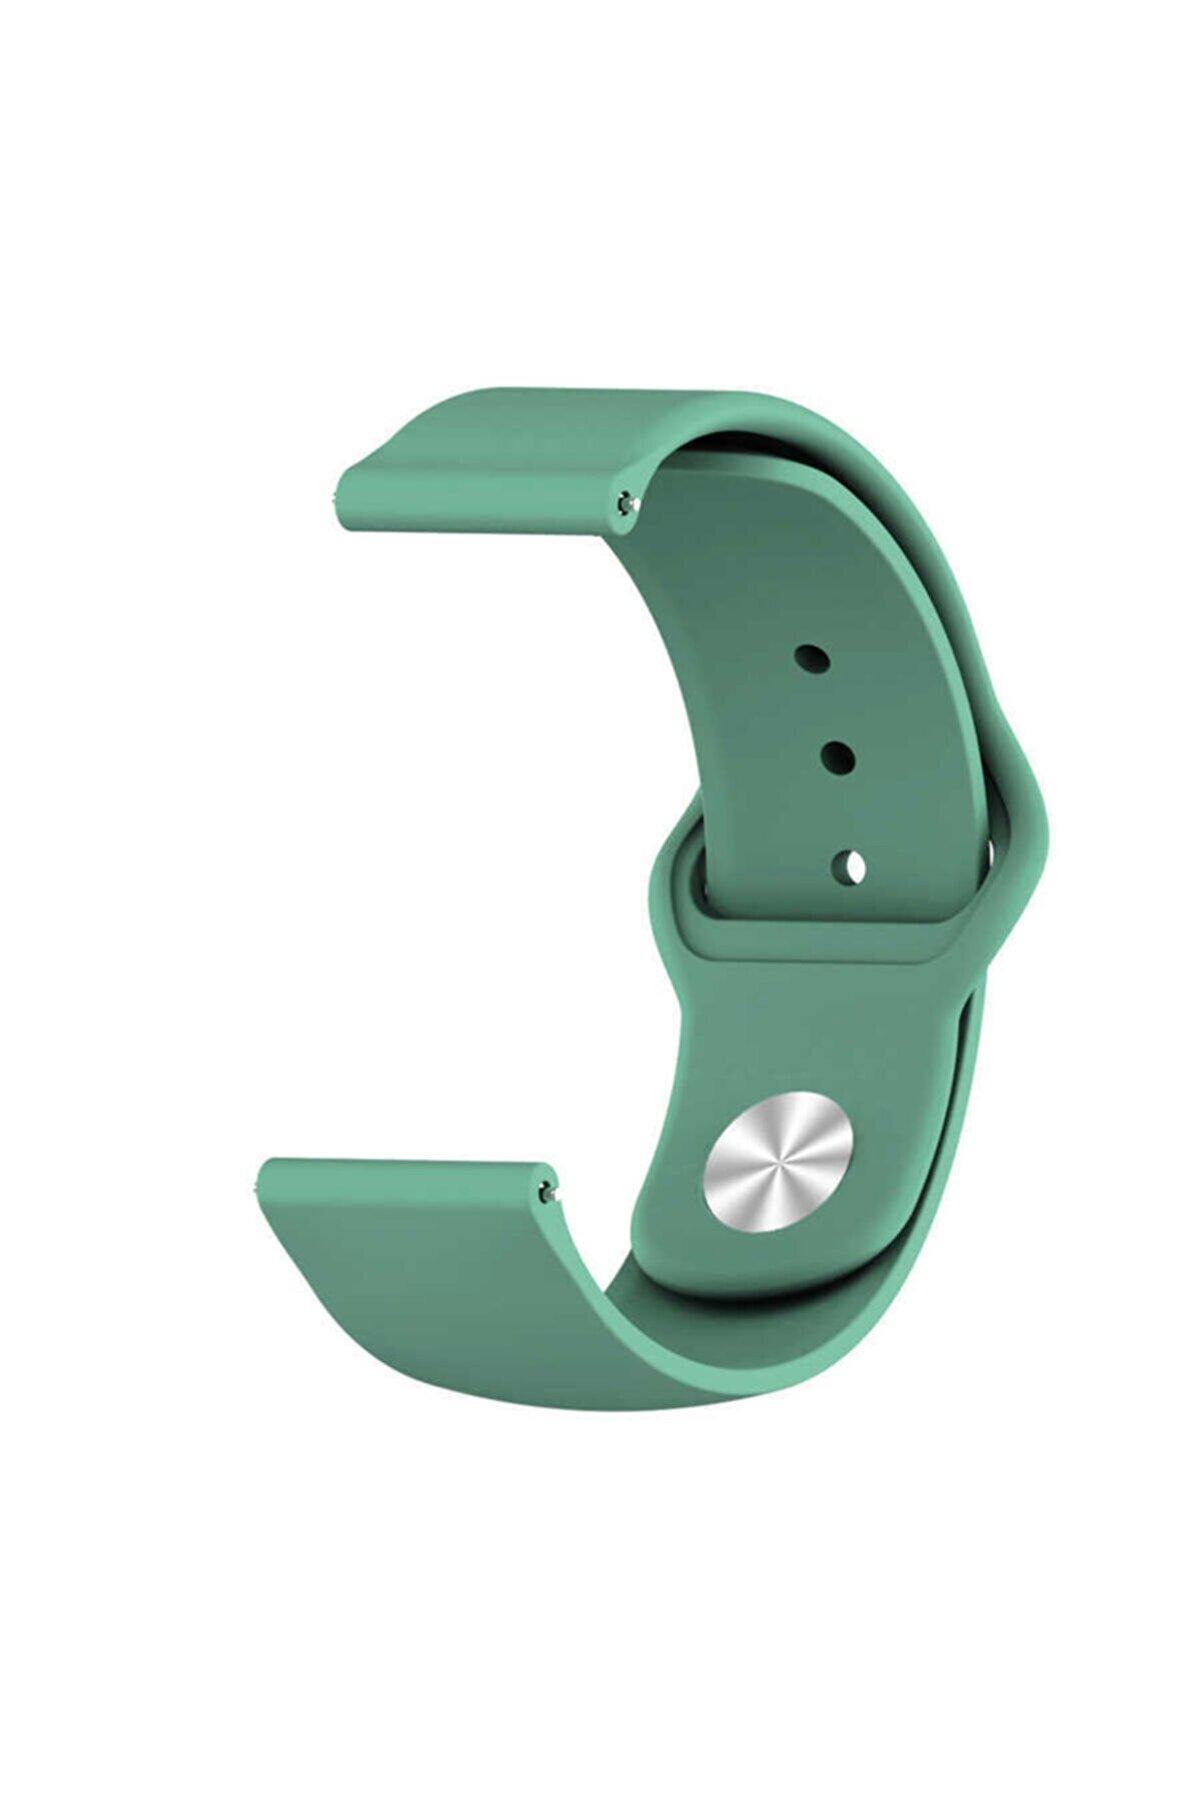 Samsung Galaxy Watch 42mm (20mm) Krd-11 Akıllı Saat Kordonu Klasik Silikon Kordon Kayış Bileklik